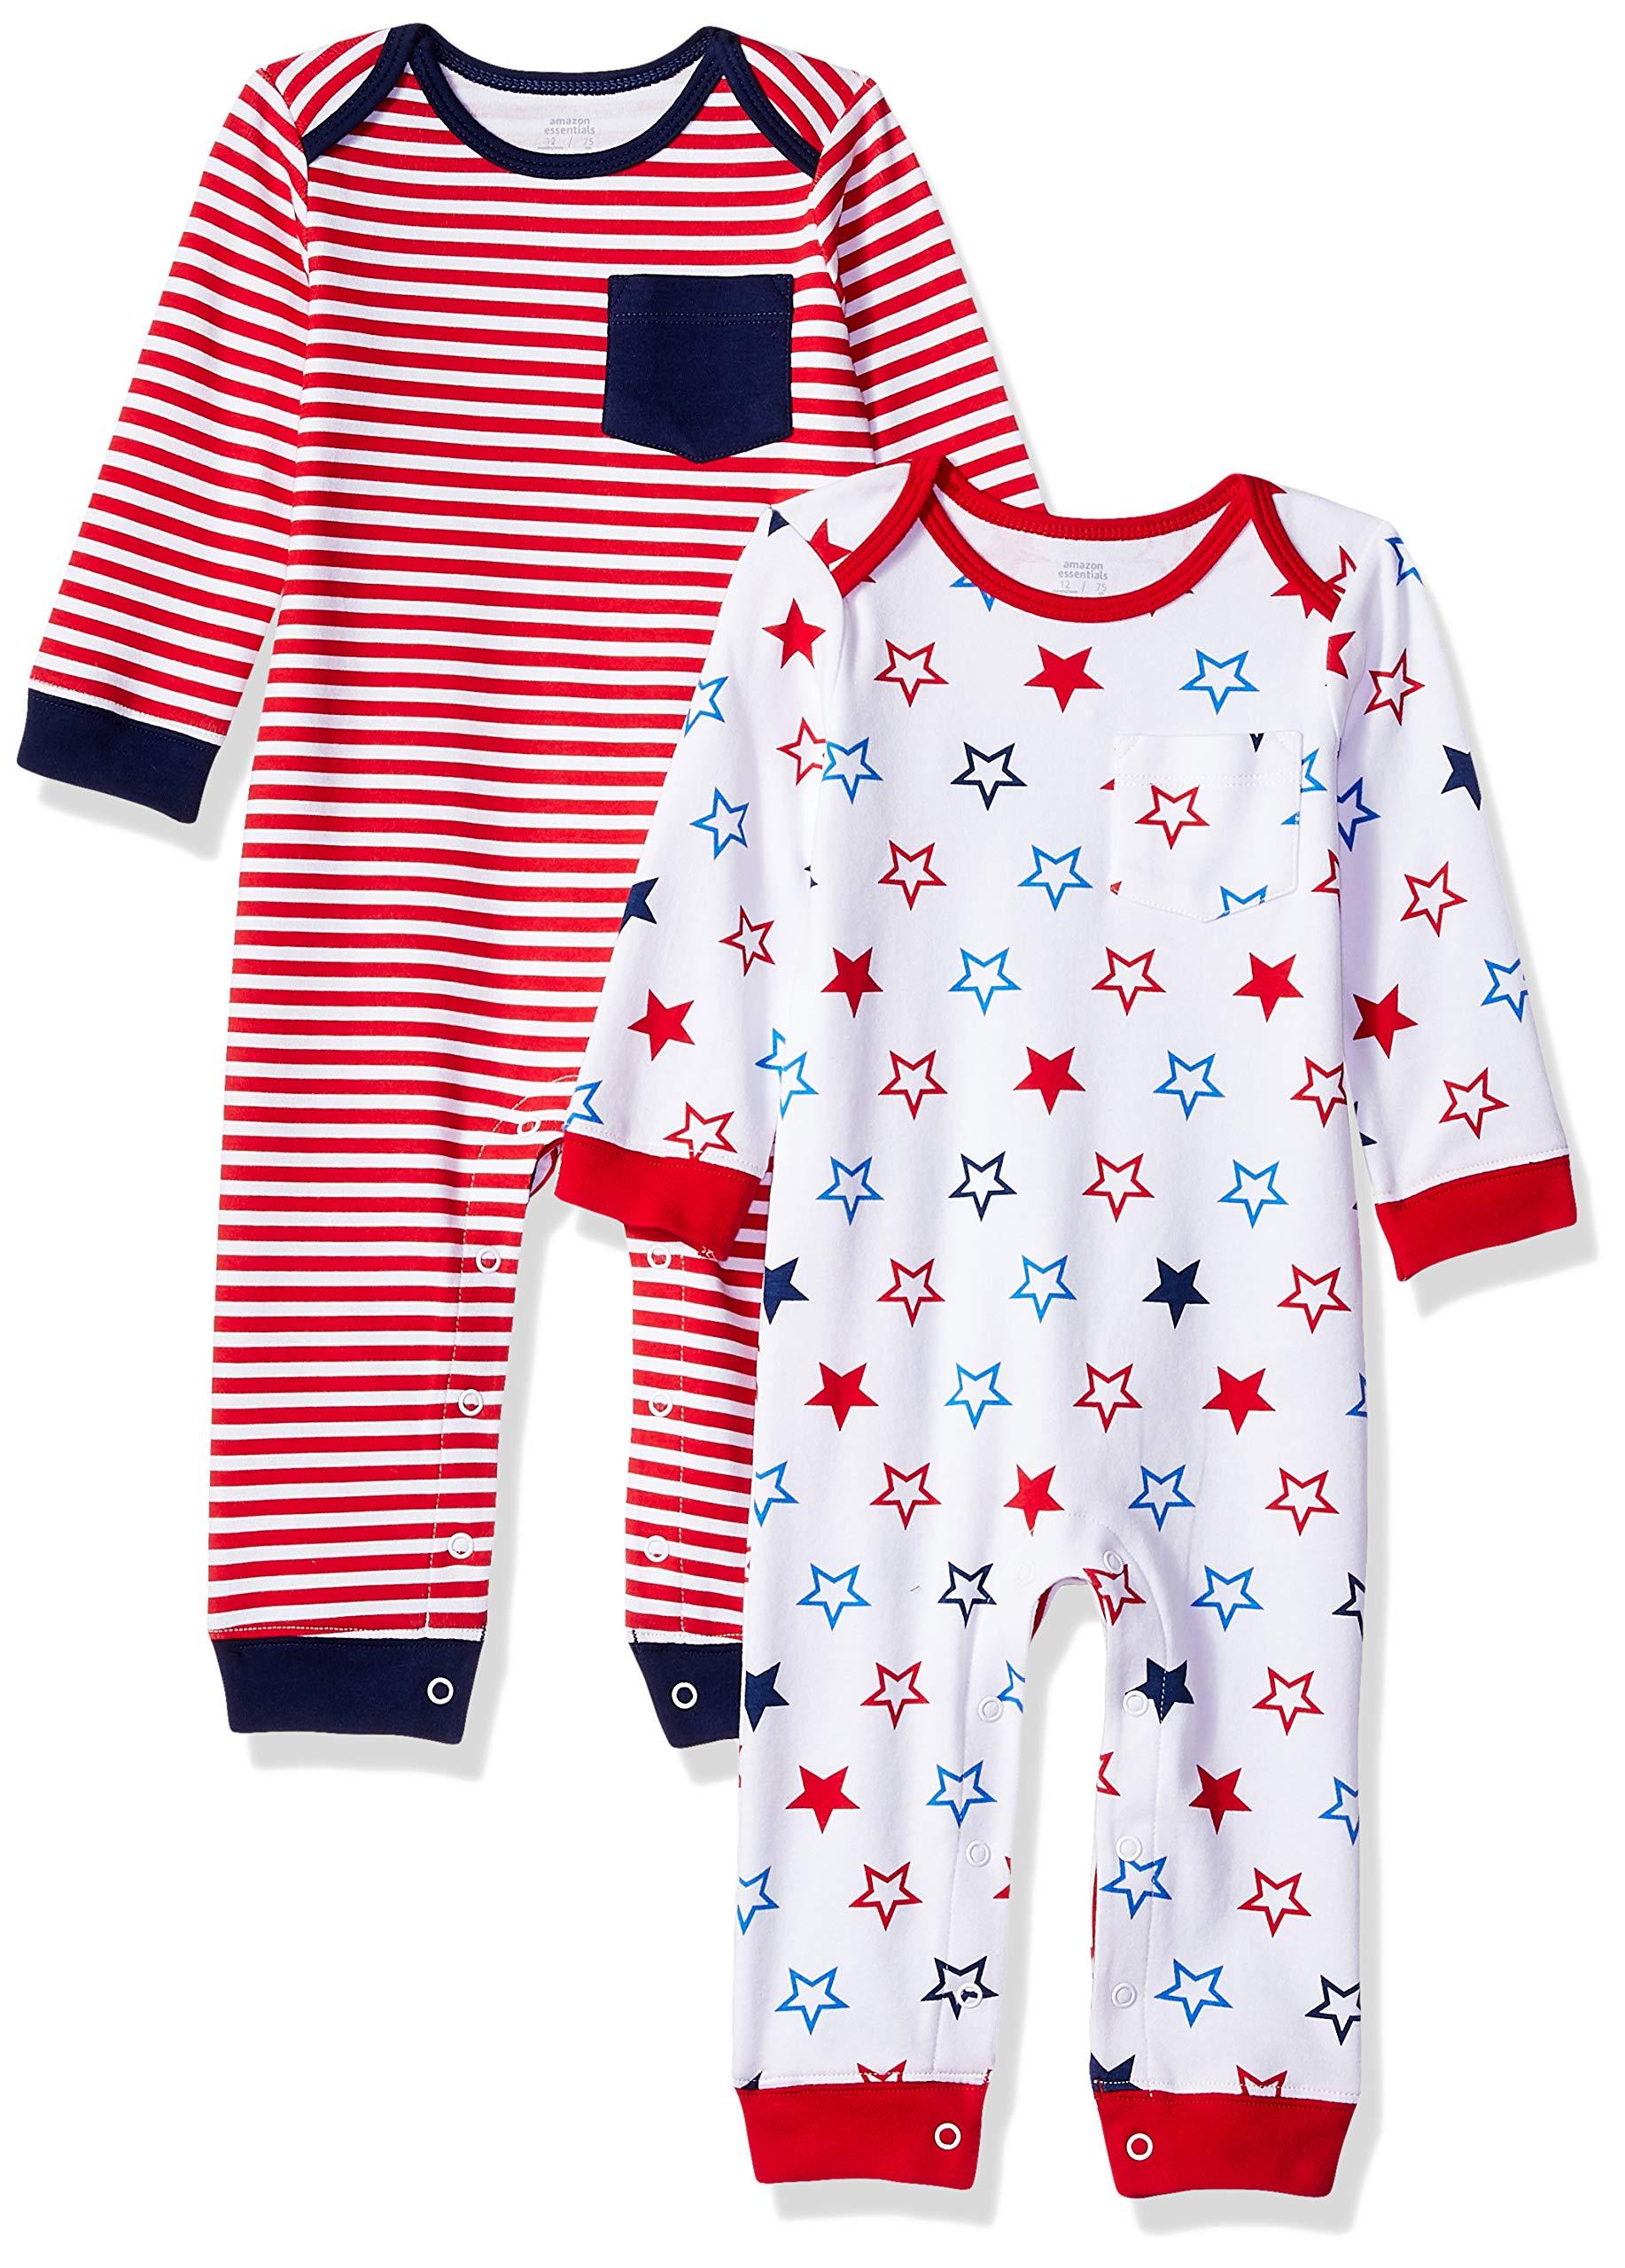 Amazon Essentials - Pack de 2 peleles para bebé 1